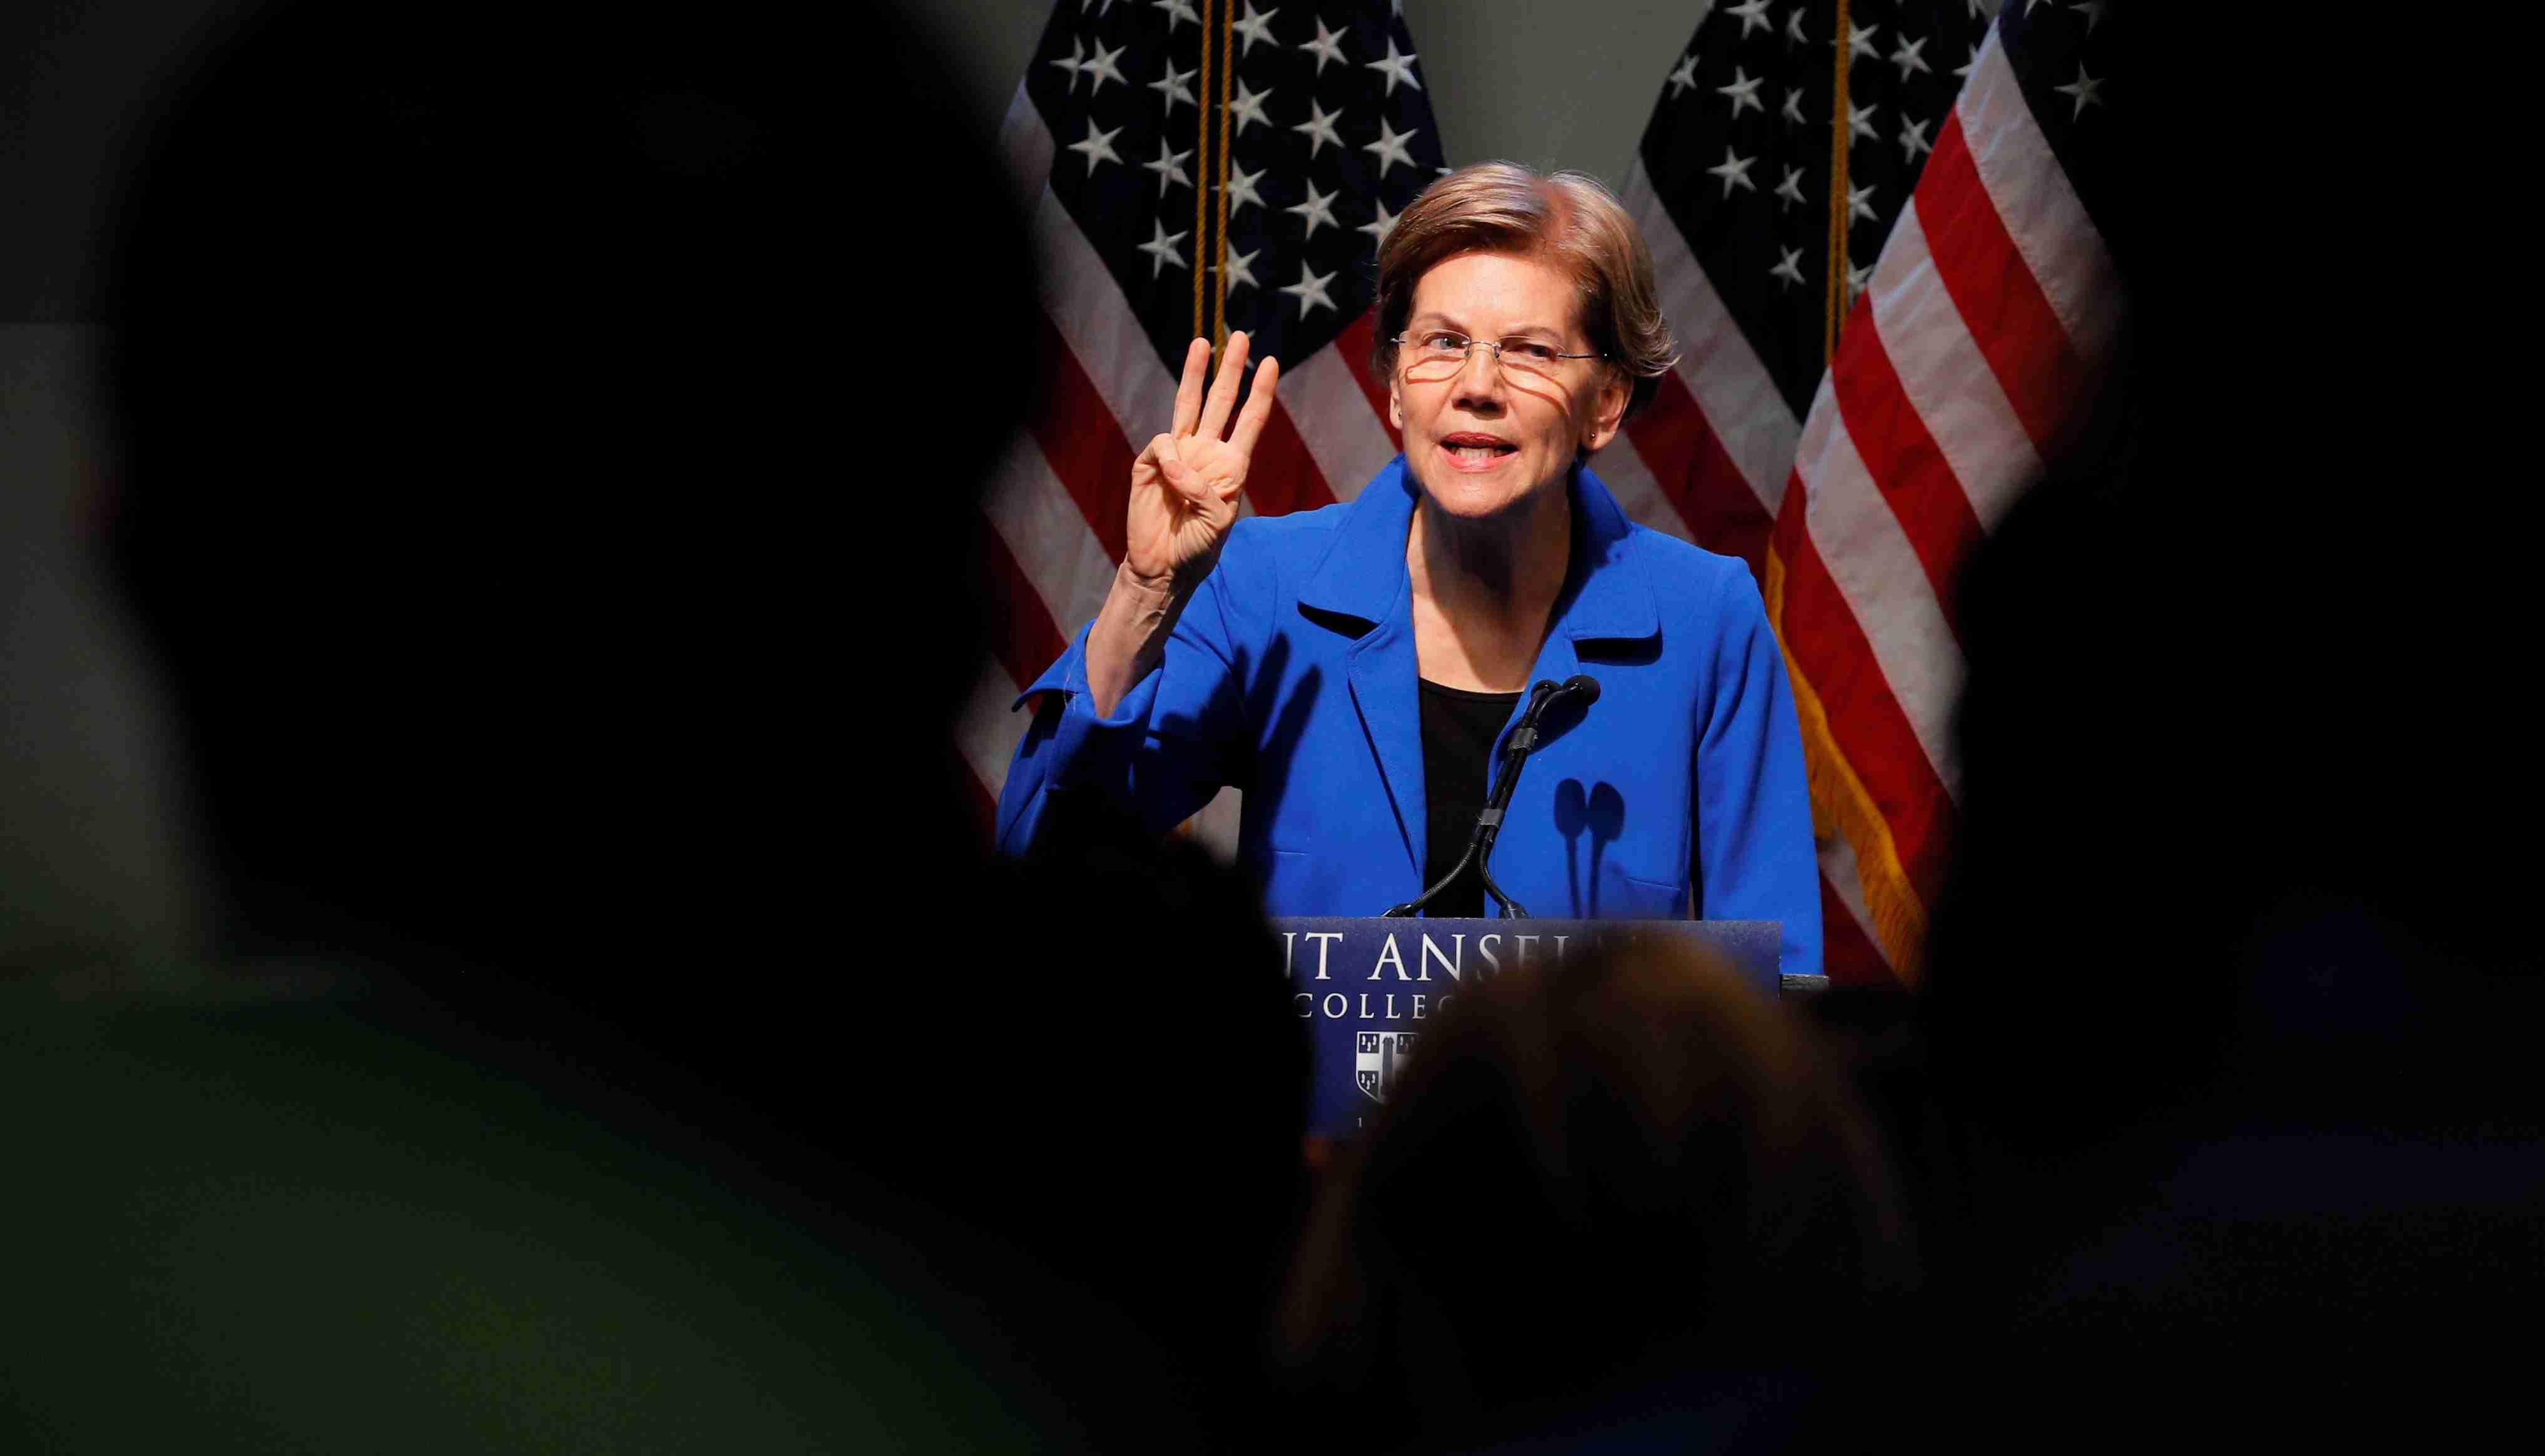 Democratic 2020 U.S. presidential candidate and U.S. Senator Elizabeth Warren (D-MA) delivers a campaign economic speech at Saint Anselm College's Institue of Politics in Manchester, New Hampshire, U.S., December 12, 2019.   REUTERS/Brian Snyder - RC2TTD9M43SN